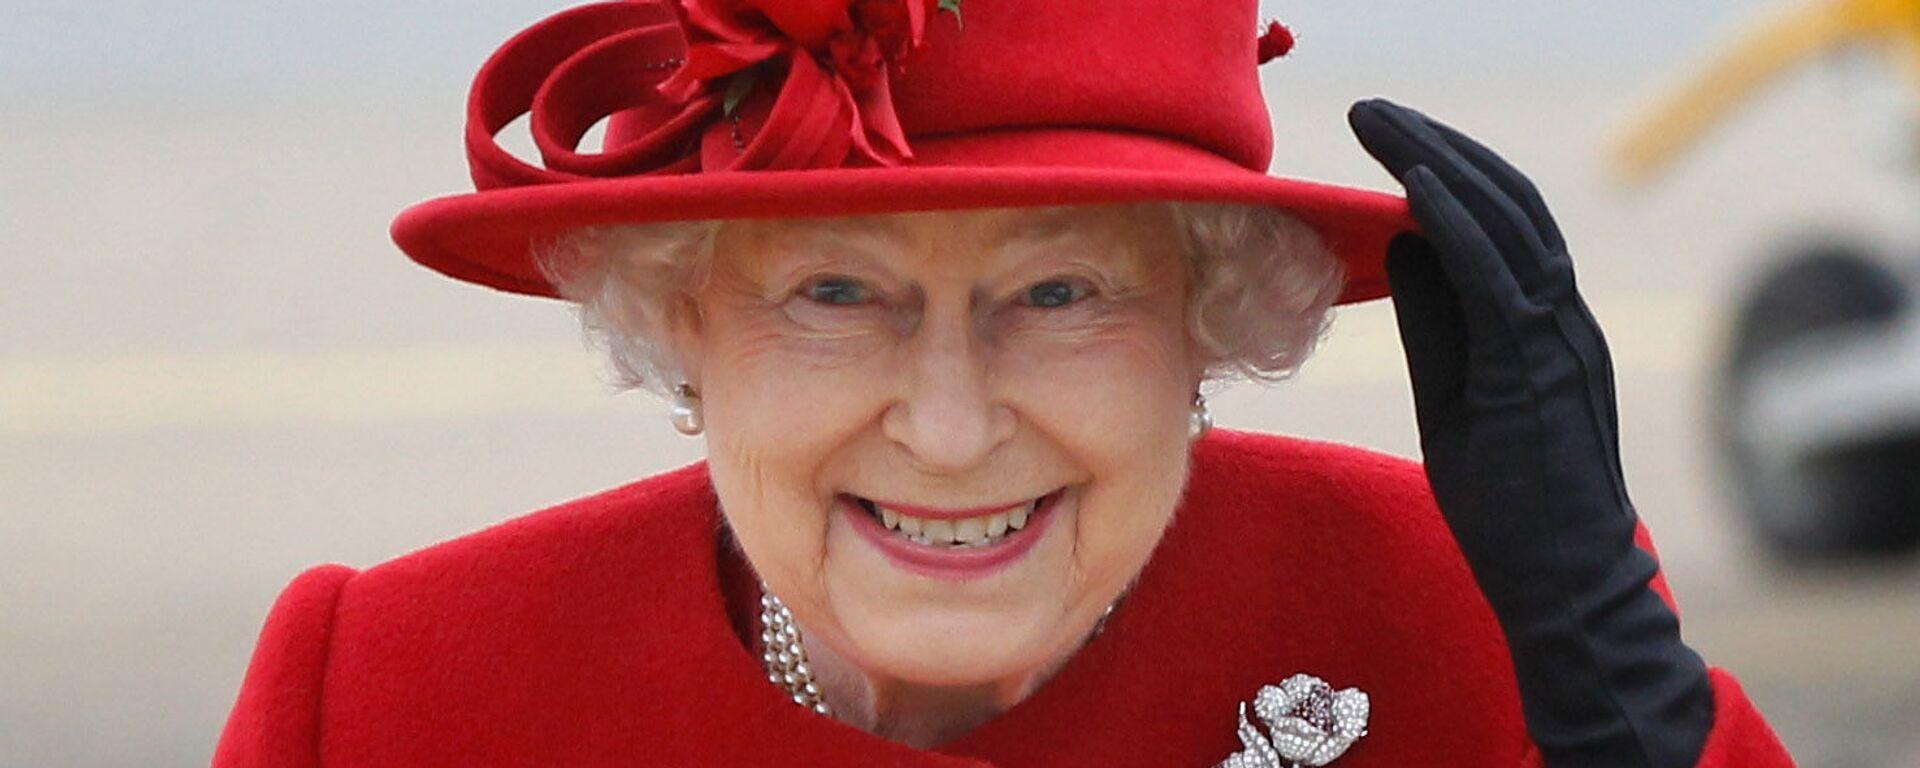 Королева Великобритании Елизавета II - Sputnik Азербайджан, 1920, 07.10.2021